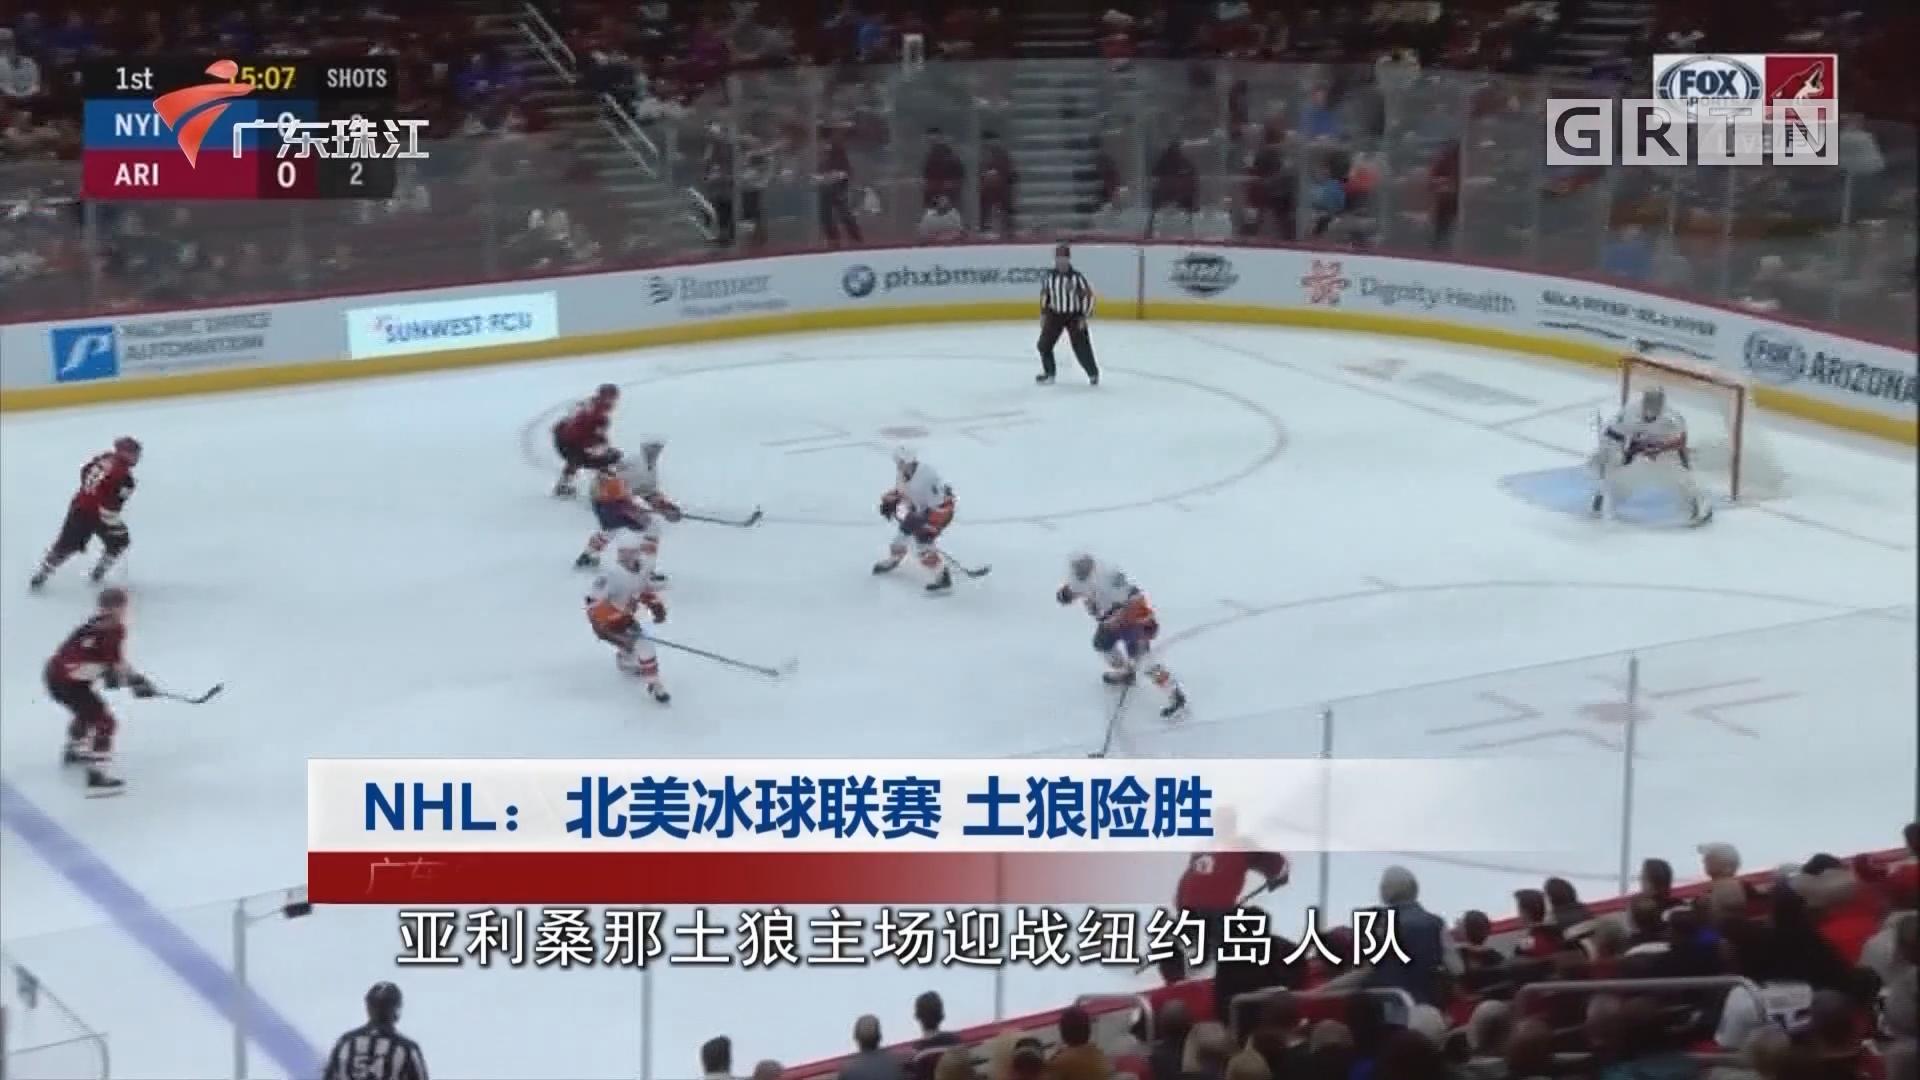 NHL:北美冰球联赛 土狼险胜